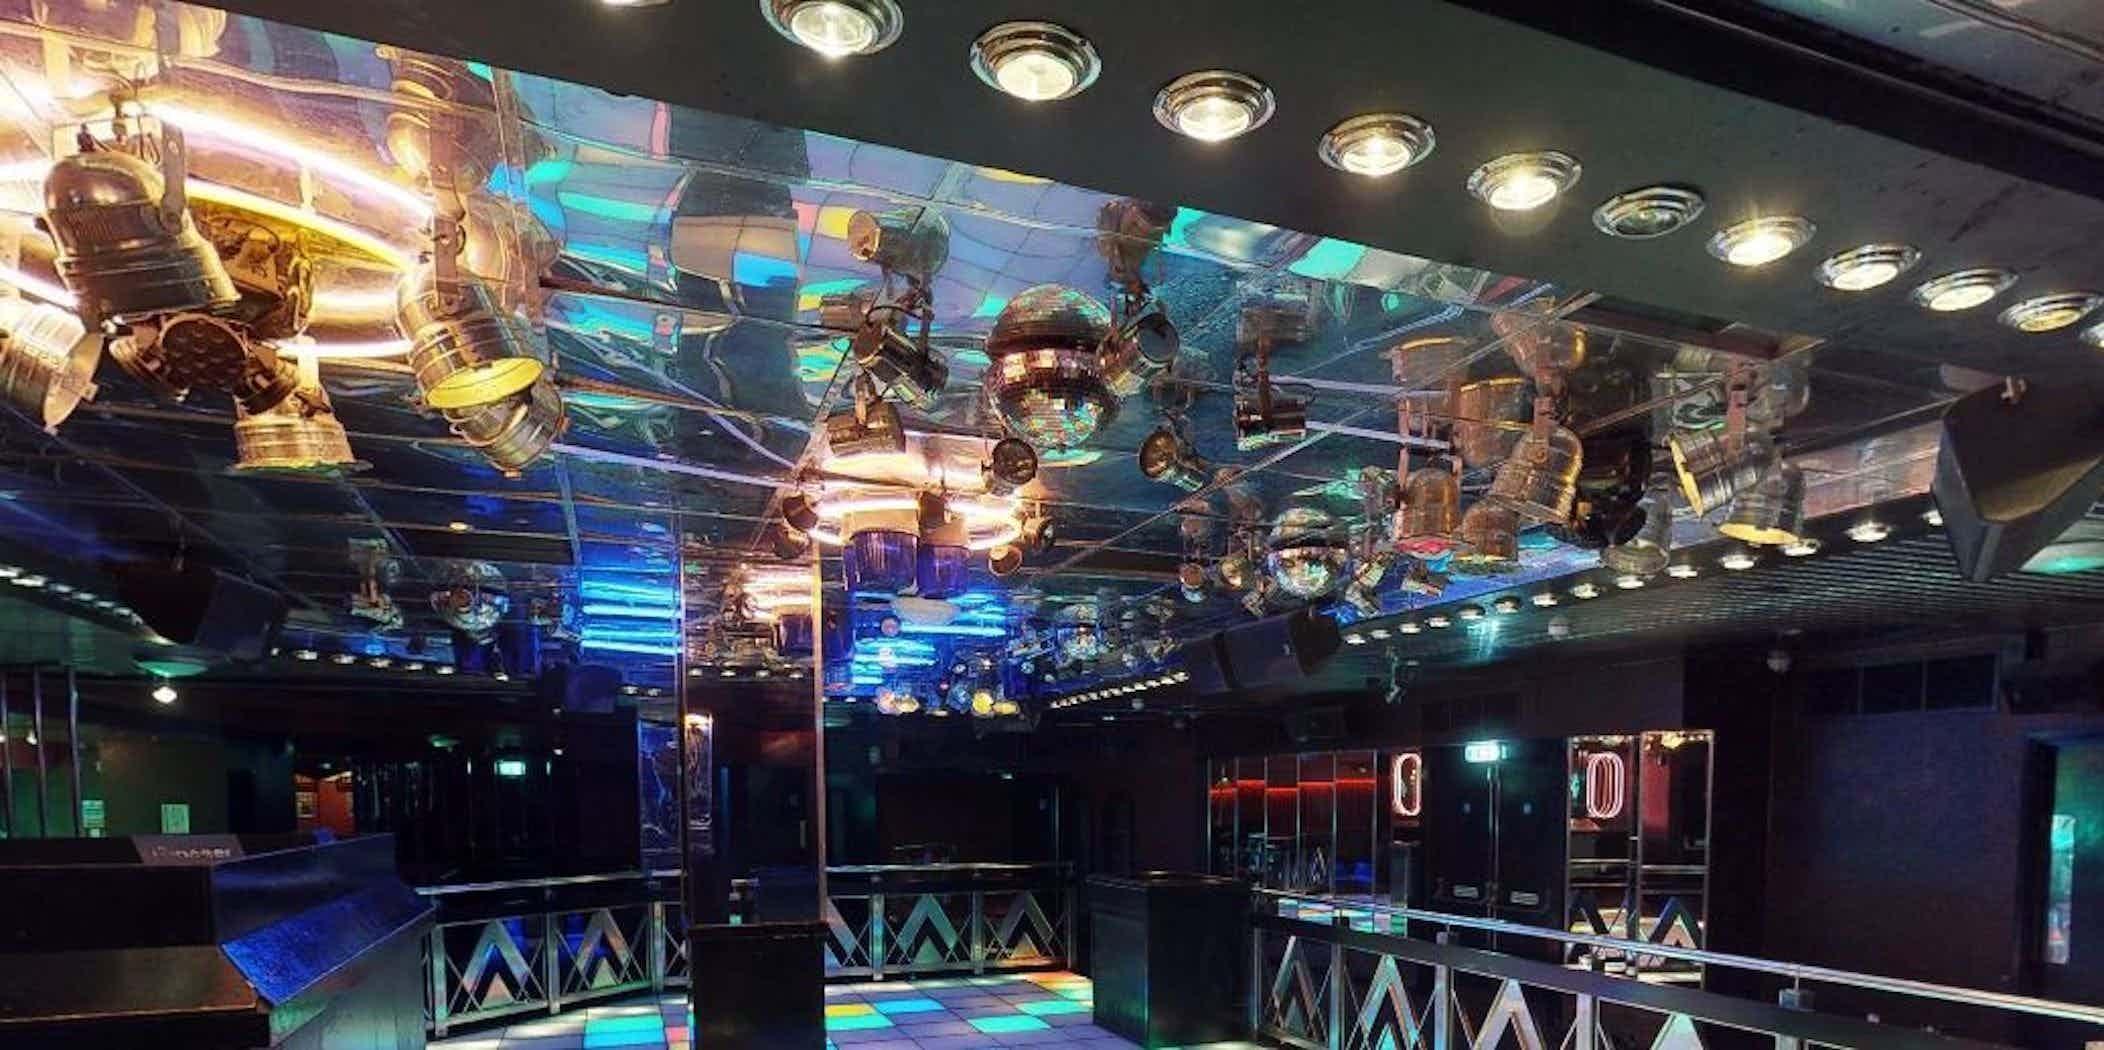 Disco Room, PRYZM Bristol